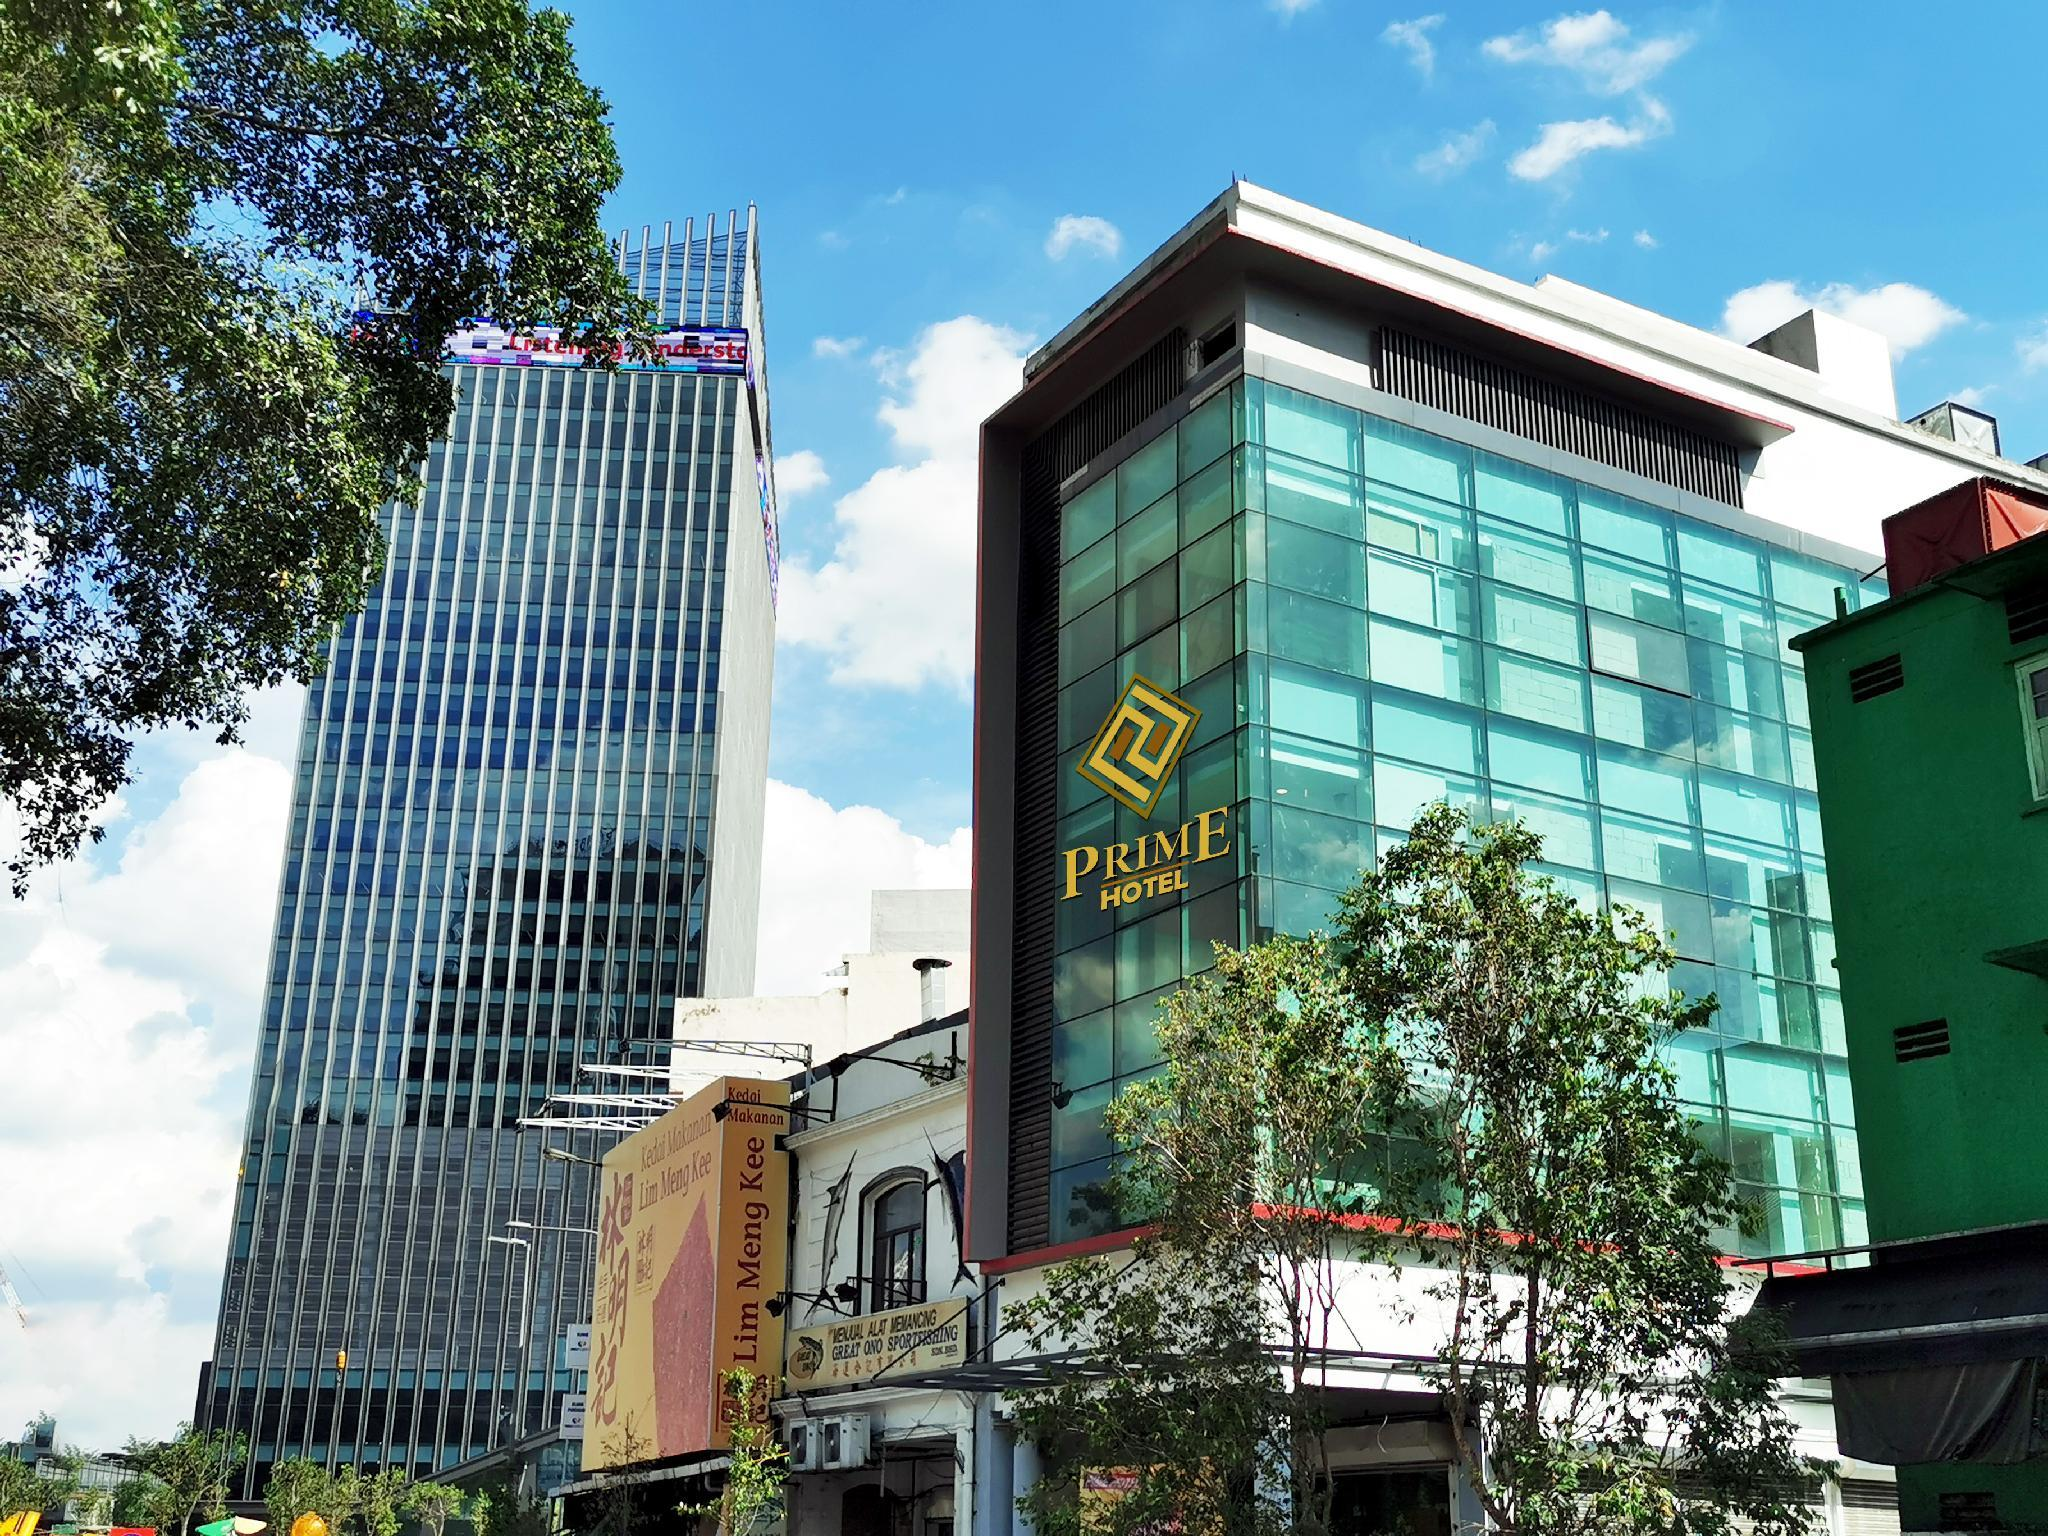 Prime Hotel @ TRX Tower, Kuala Lumpur